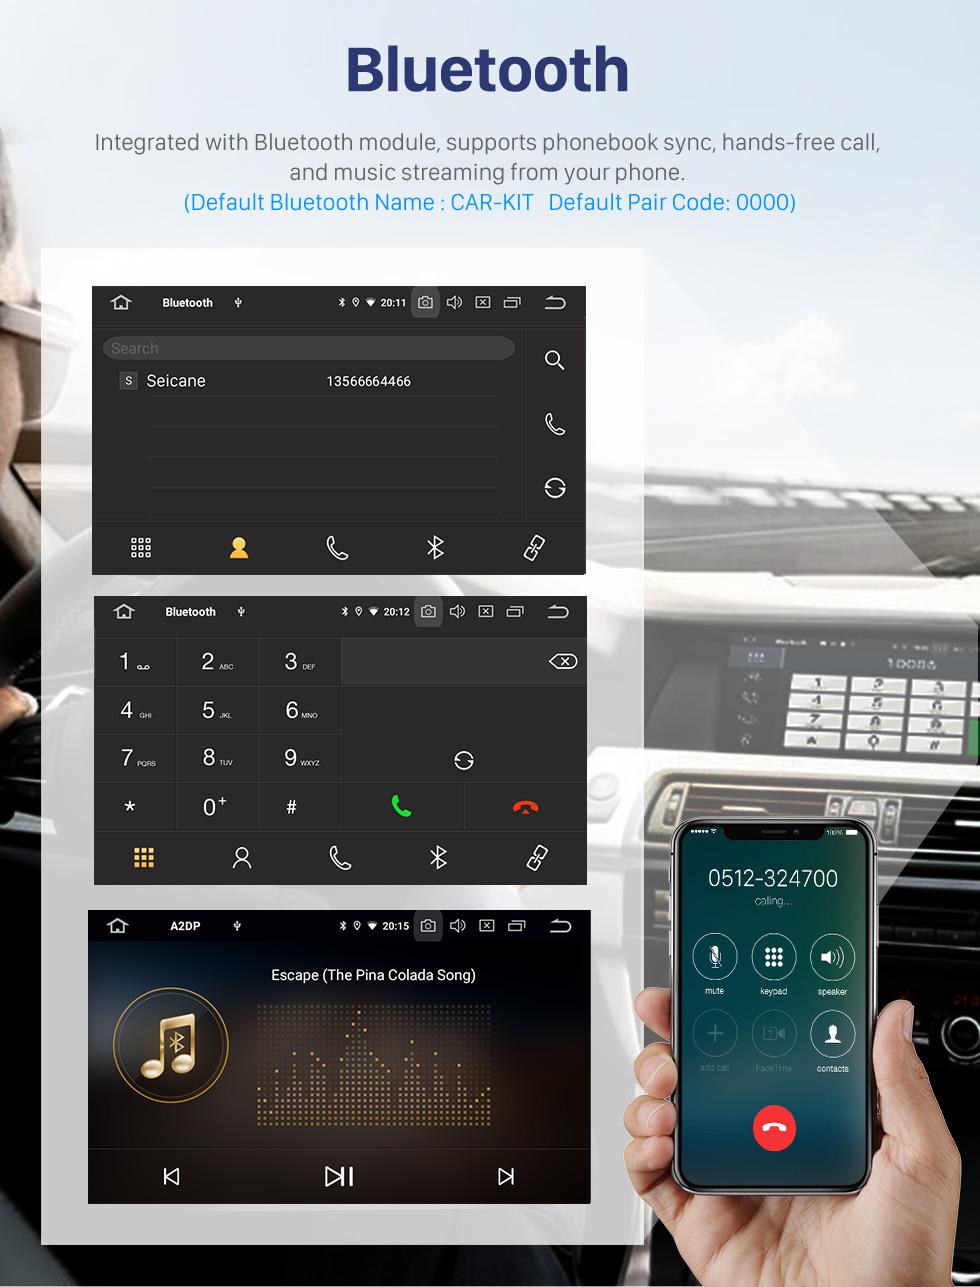 Seicane Android 10.0 2008-2015 Mazda 6 Rui Wing Radio Sistema de navegación GPS con HD 1024 * 600 Pantalla táctil Bluetooth Enlace espejo TPMS OBD DVR Cámara de visión trasera TV USB 3G WIFI CPU Quad Core